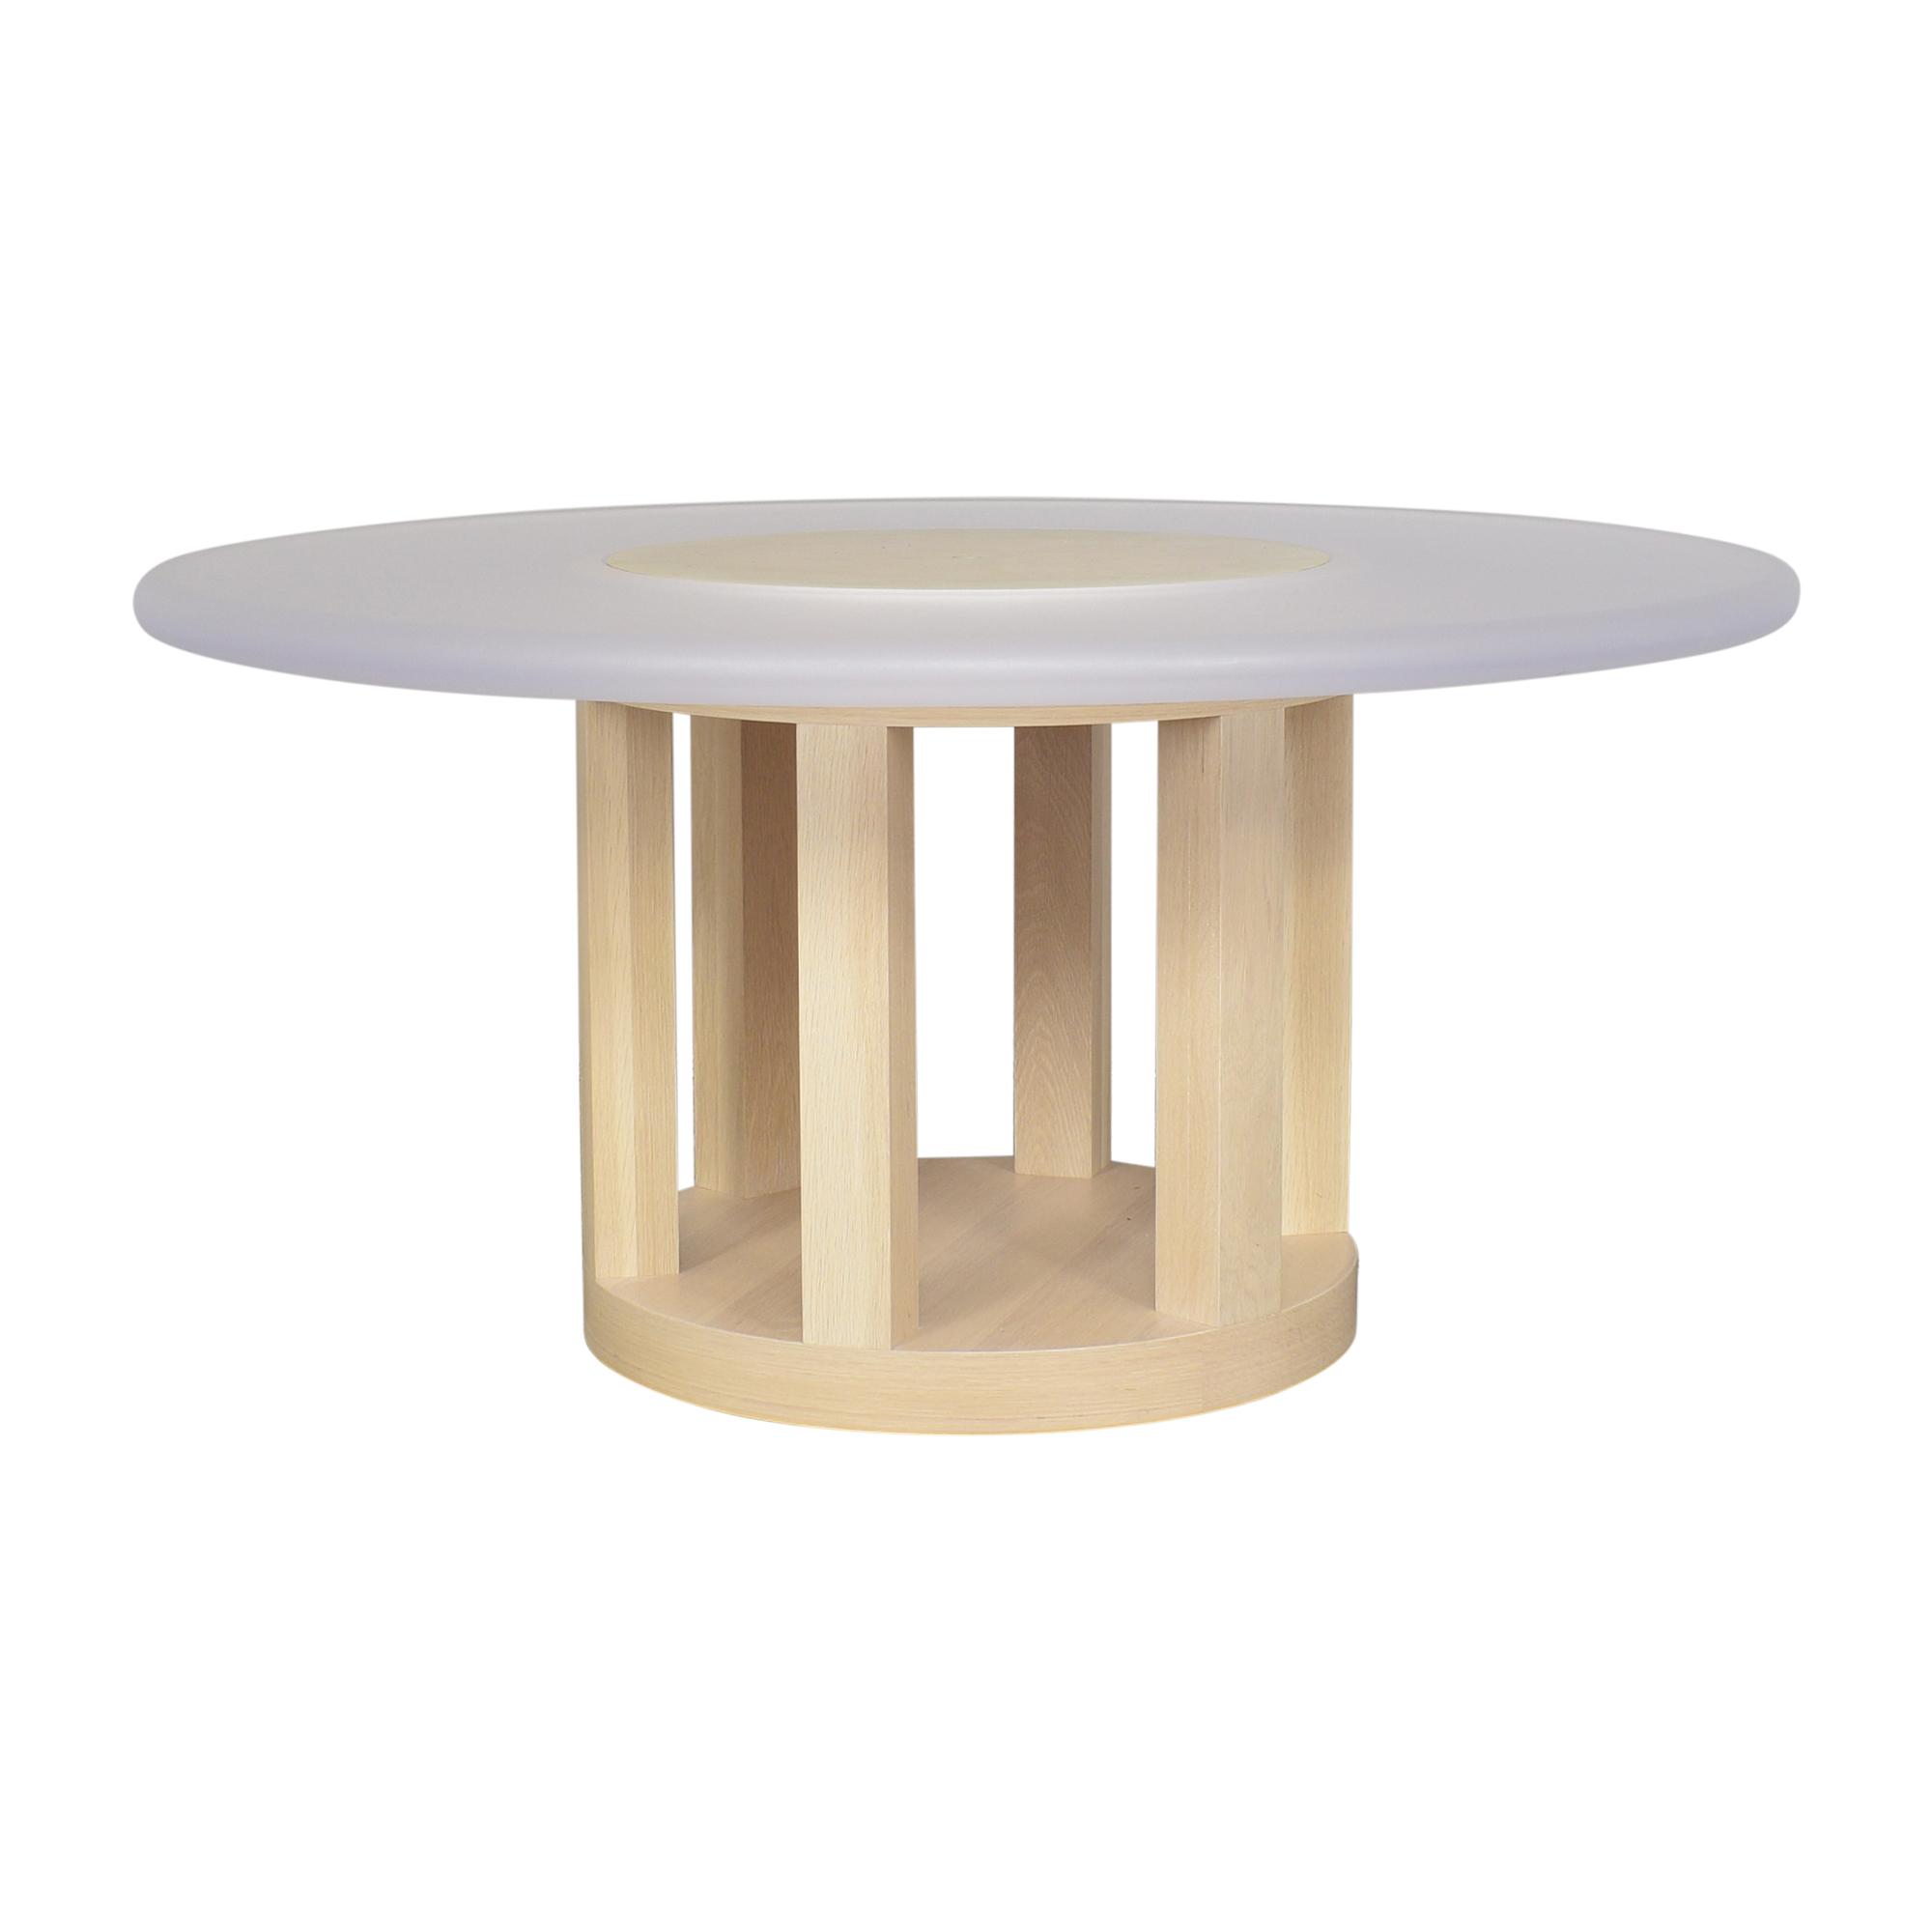 Benjamin Noriega-Ortiz Custom Round Dining Table pa